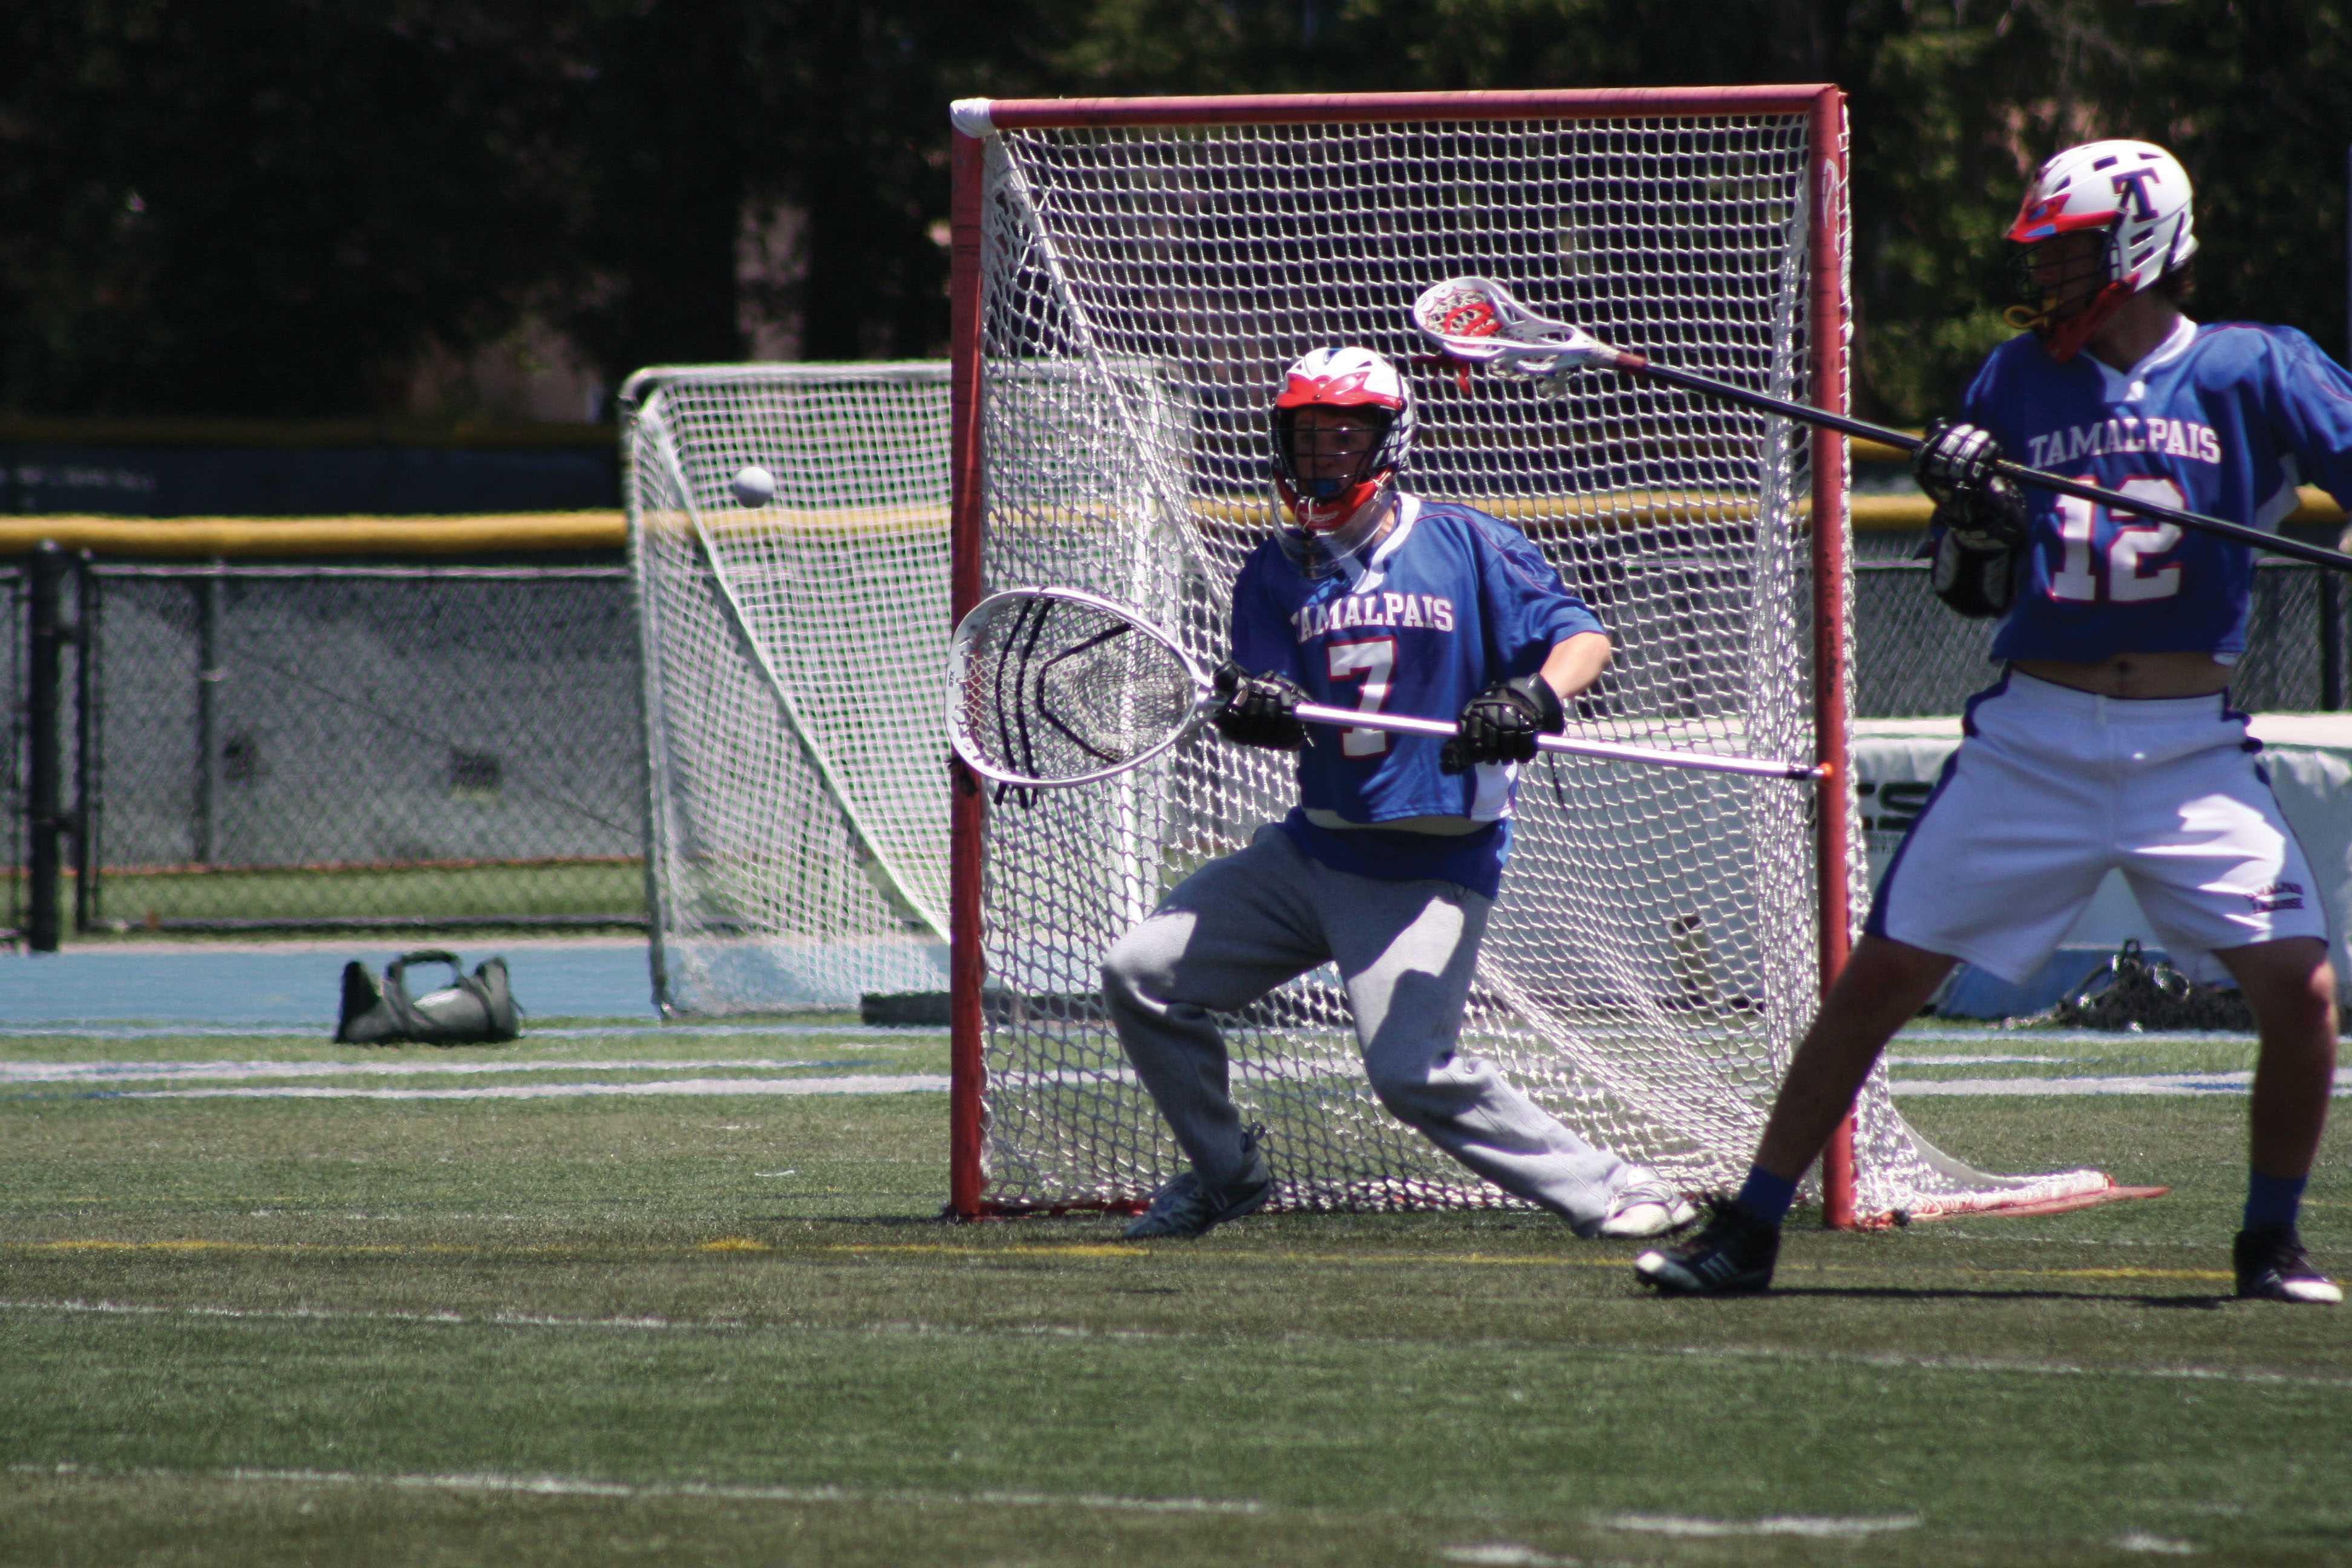 SAVE: Goalie Trent Miller blocks a shot during the NCS quarterfinals against Marin Catholic. Photo courtesy of Dina Falk